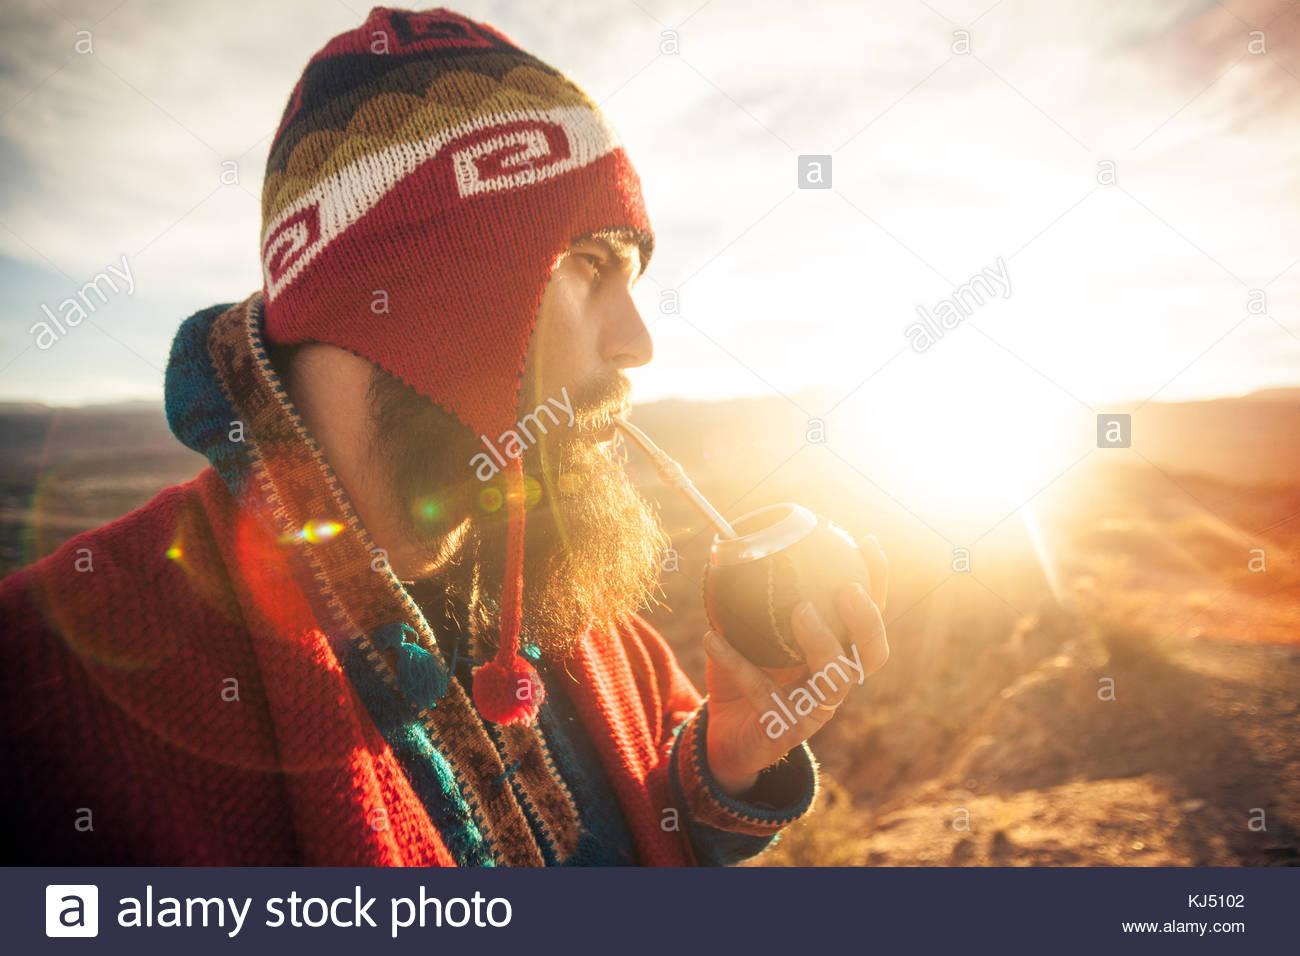 Hombre beber matcha al atardecer Imagen De Stock